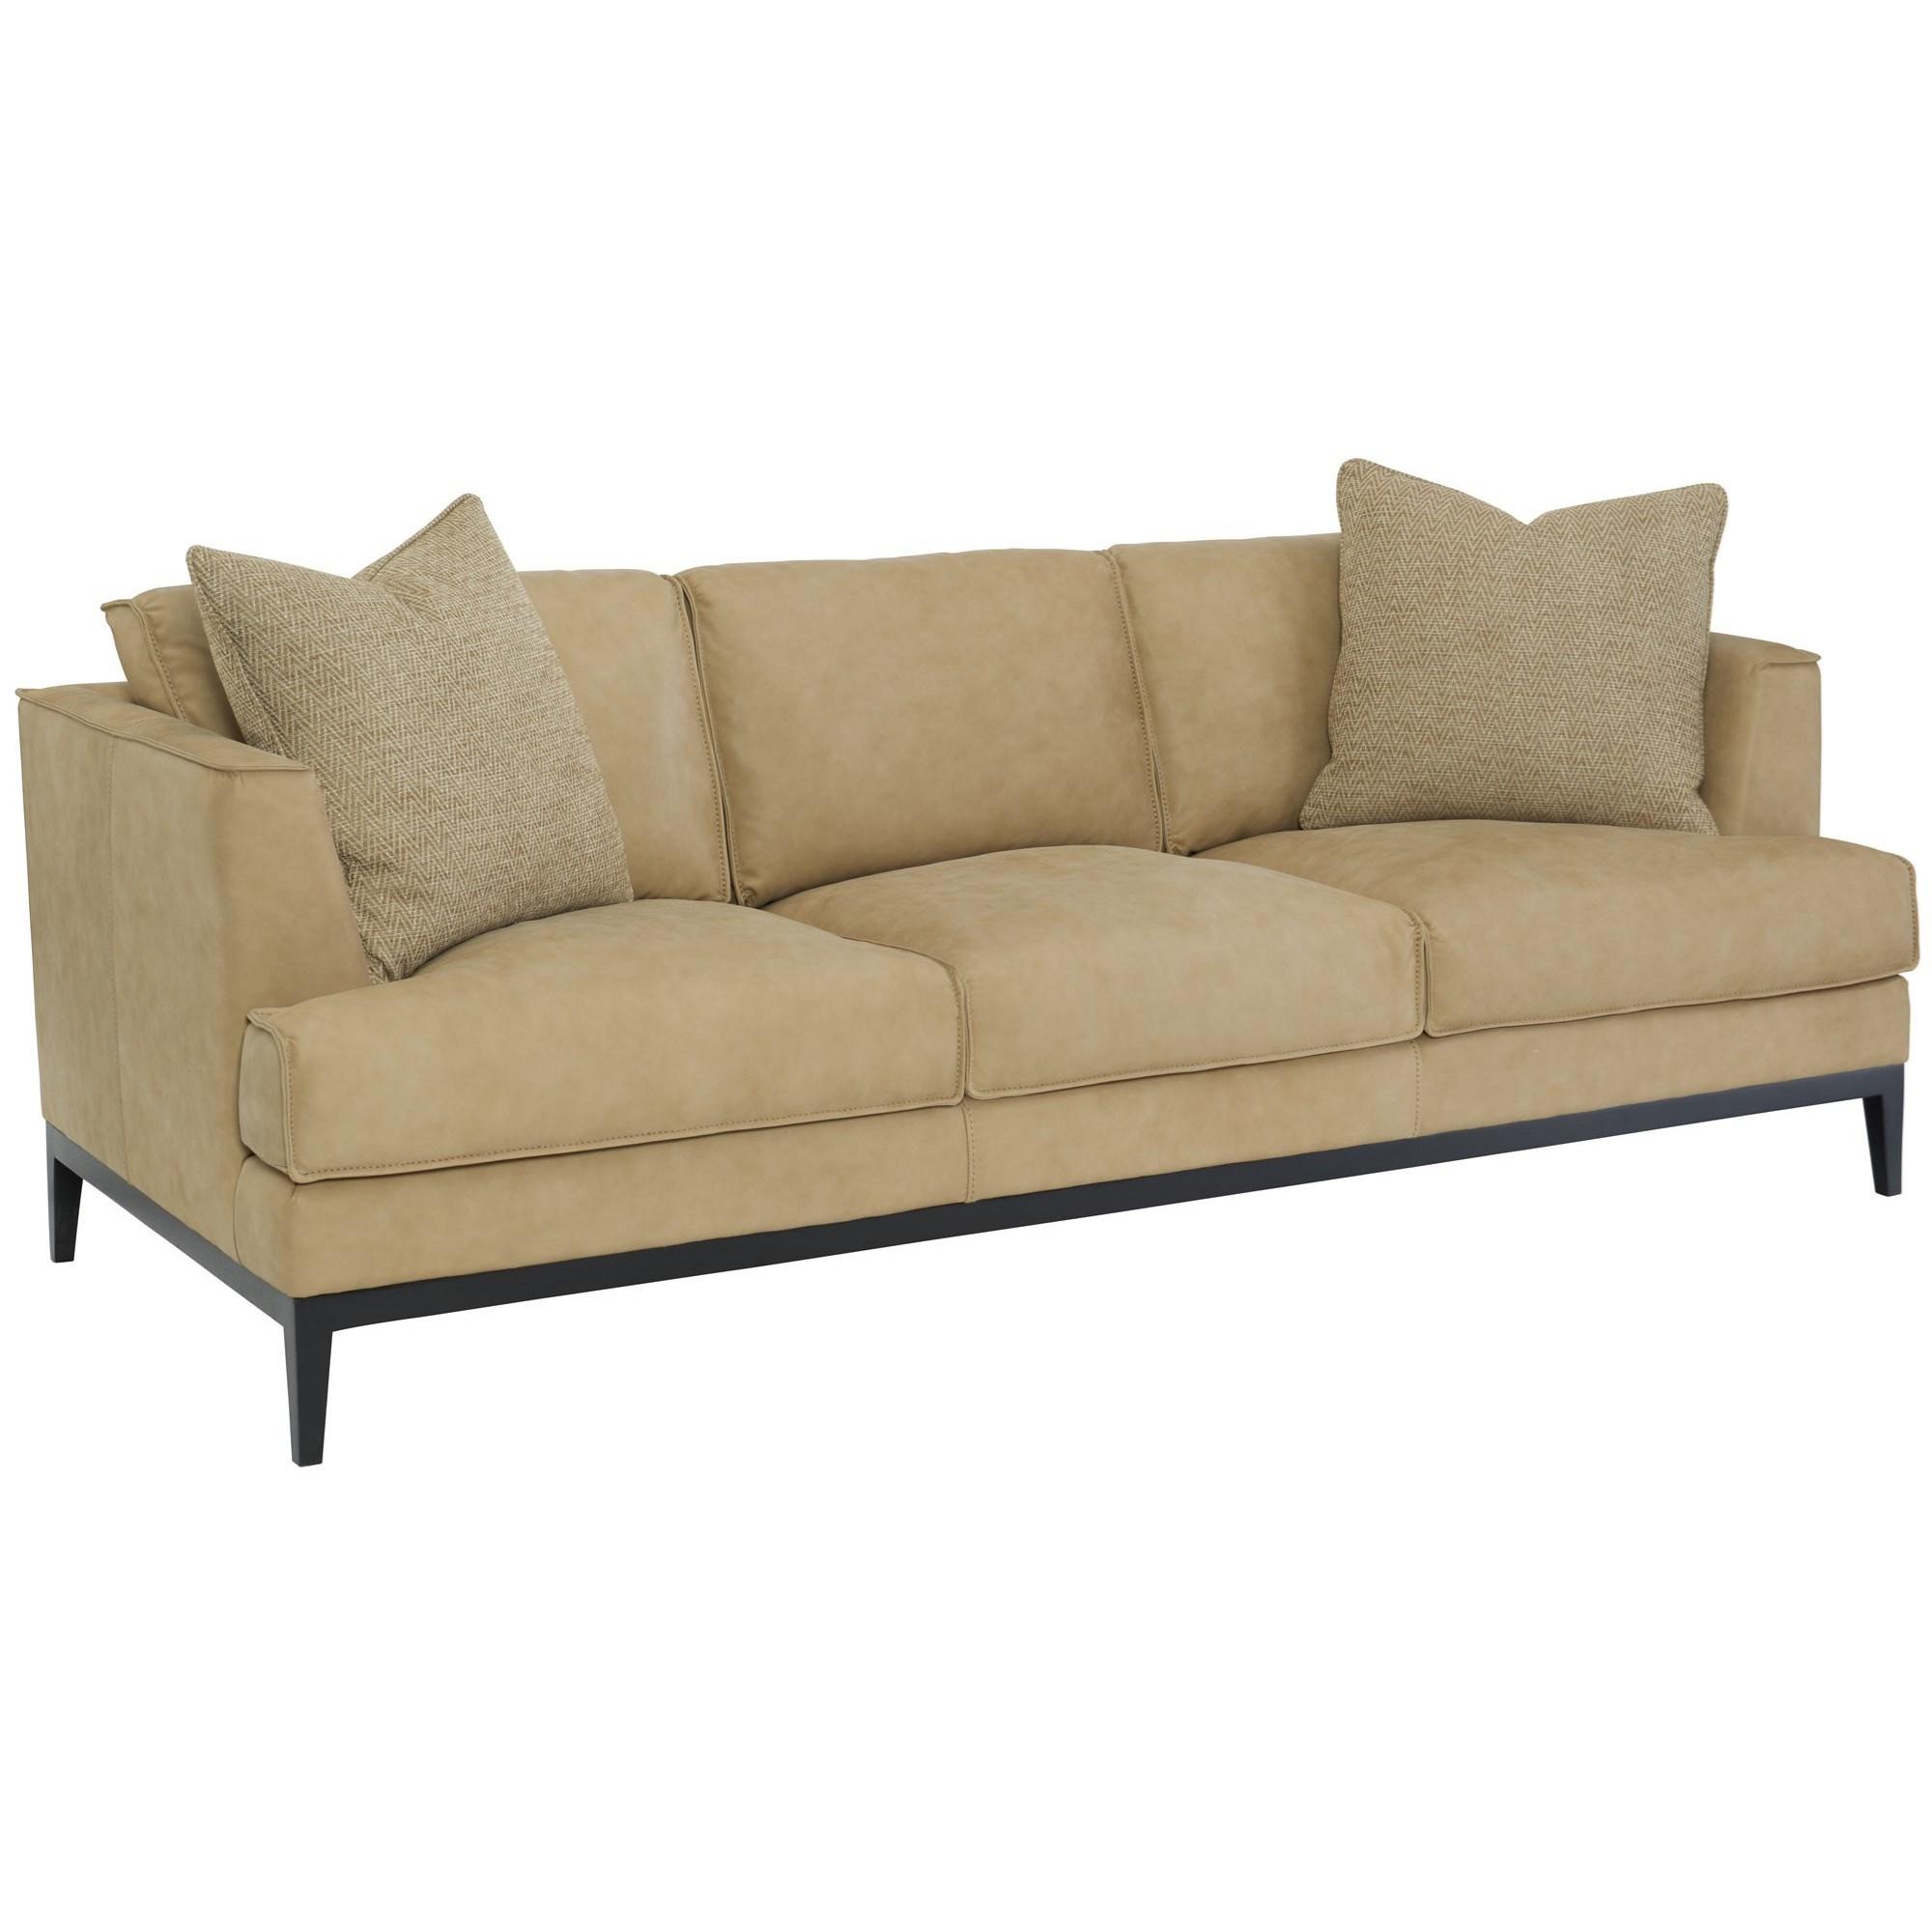 Bernhardt Alford Contemporary Leather Sofa